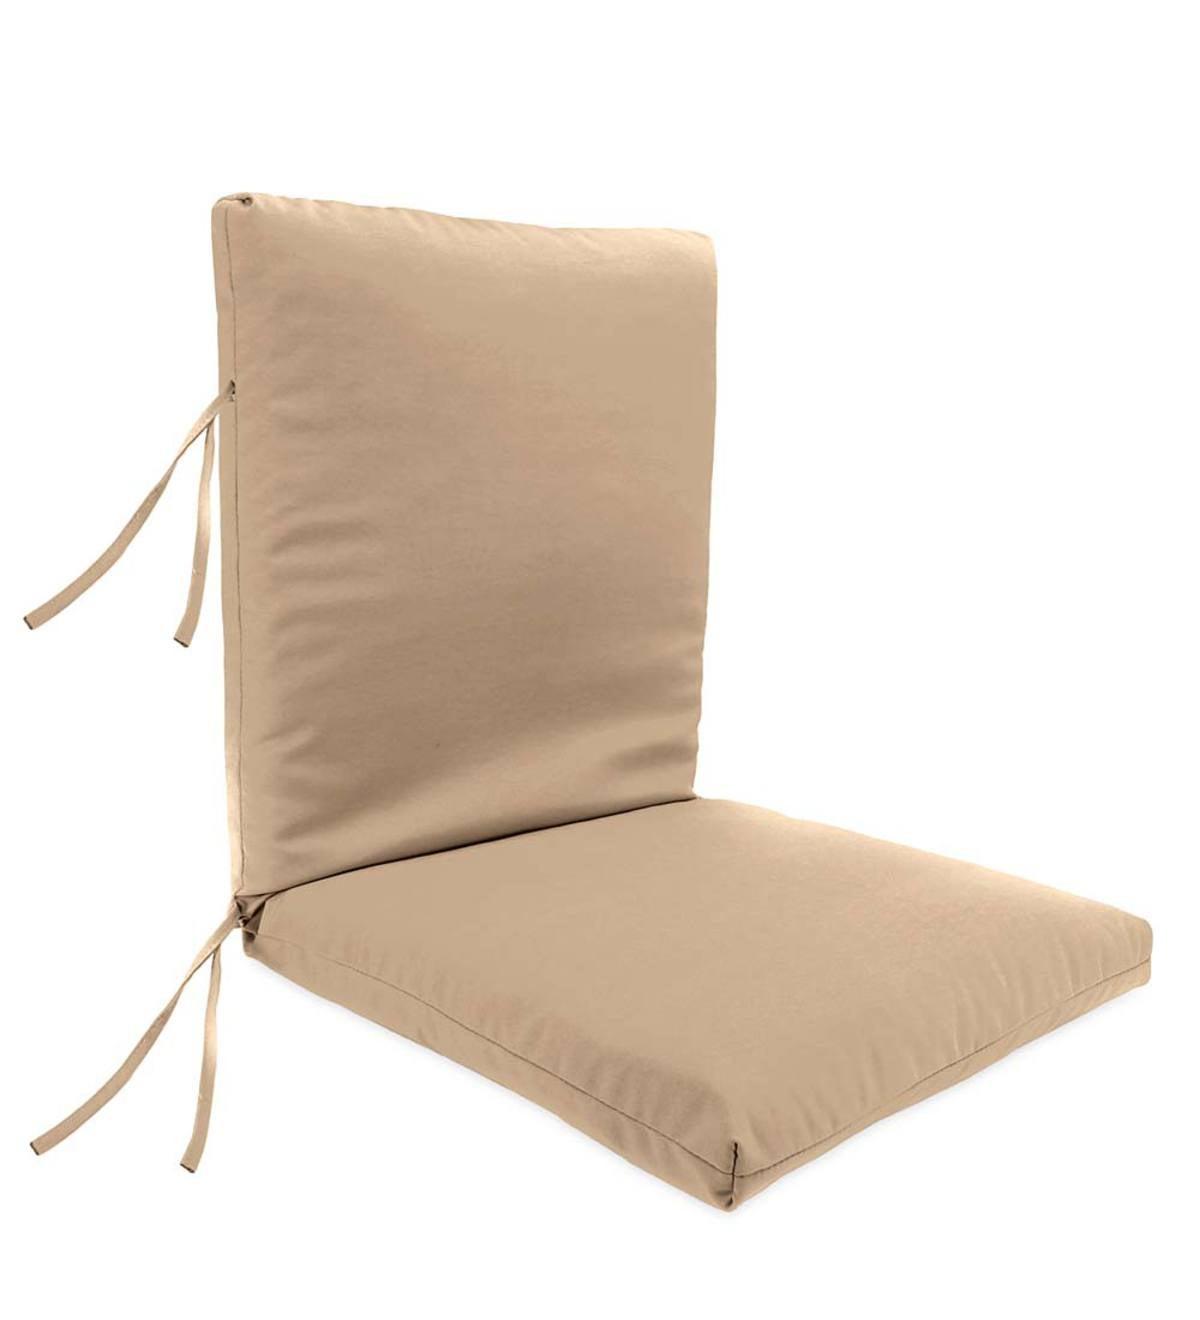 Sunbrella Classic High Back Chair Cushion With Ties 46x 20x 4